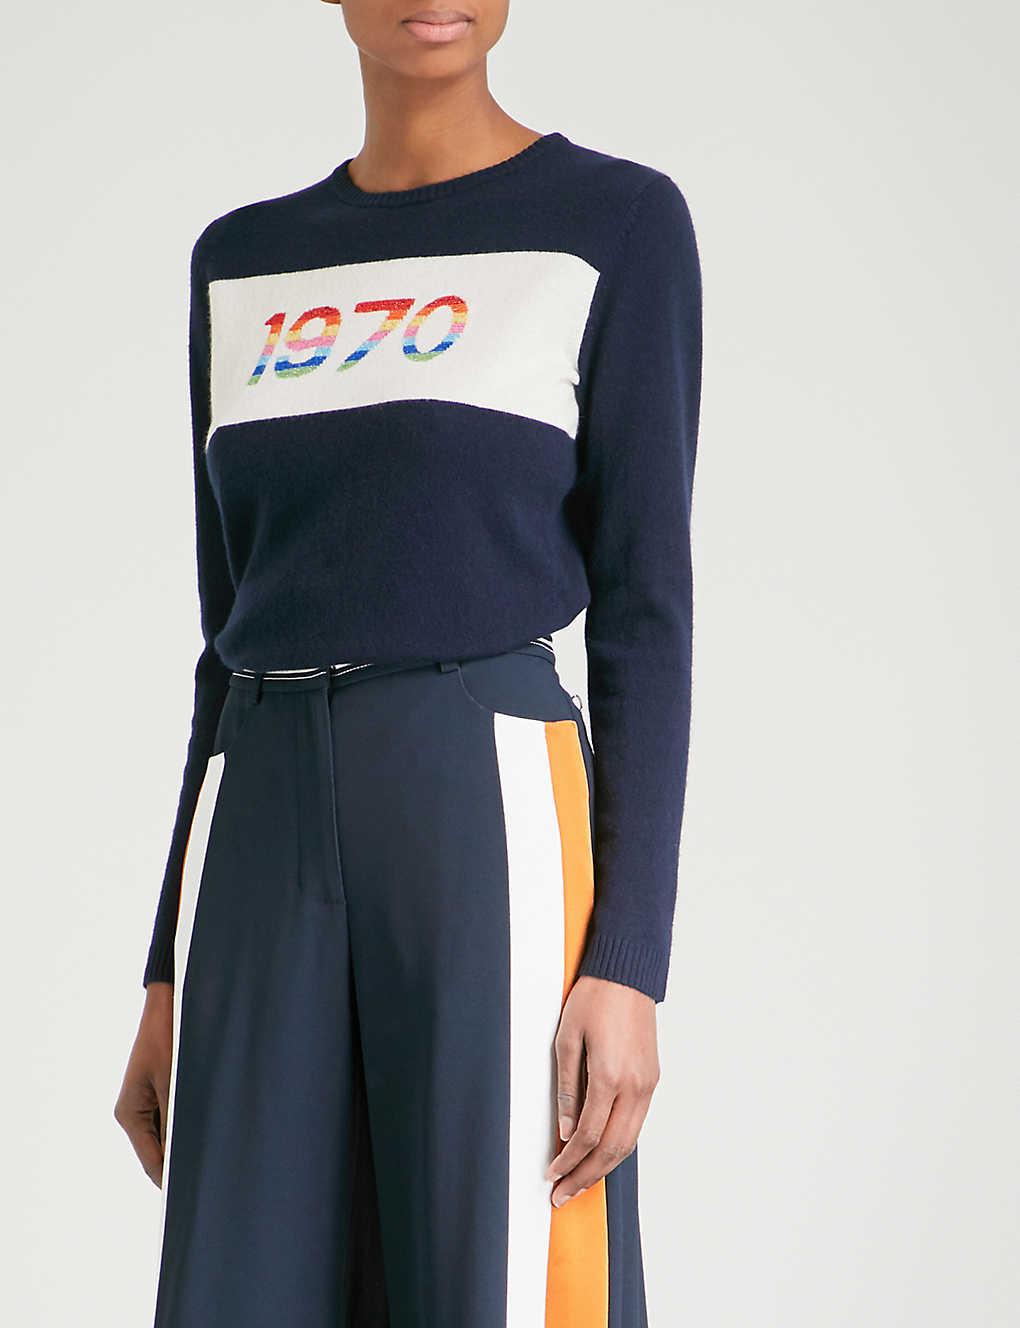 BELLA FREUD 1970 Rainbow cashmere-blend jumper